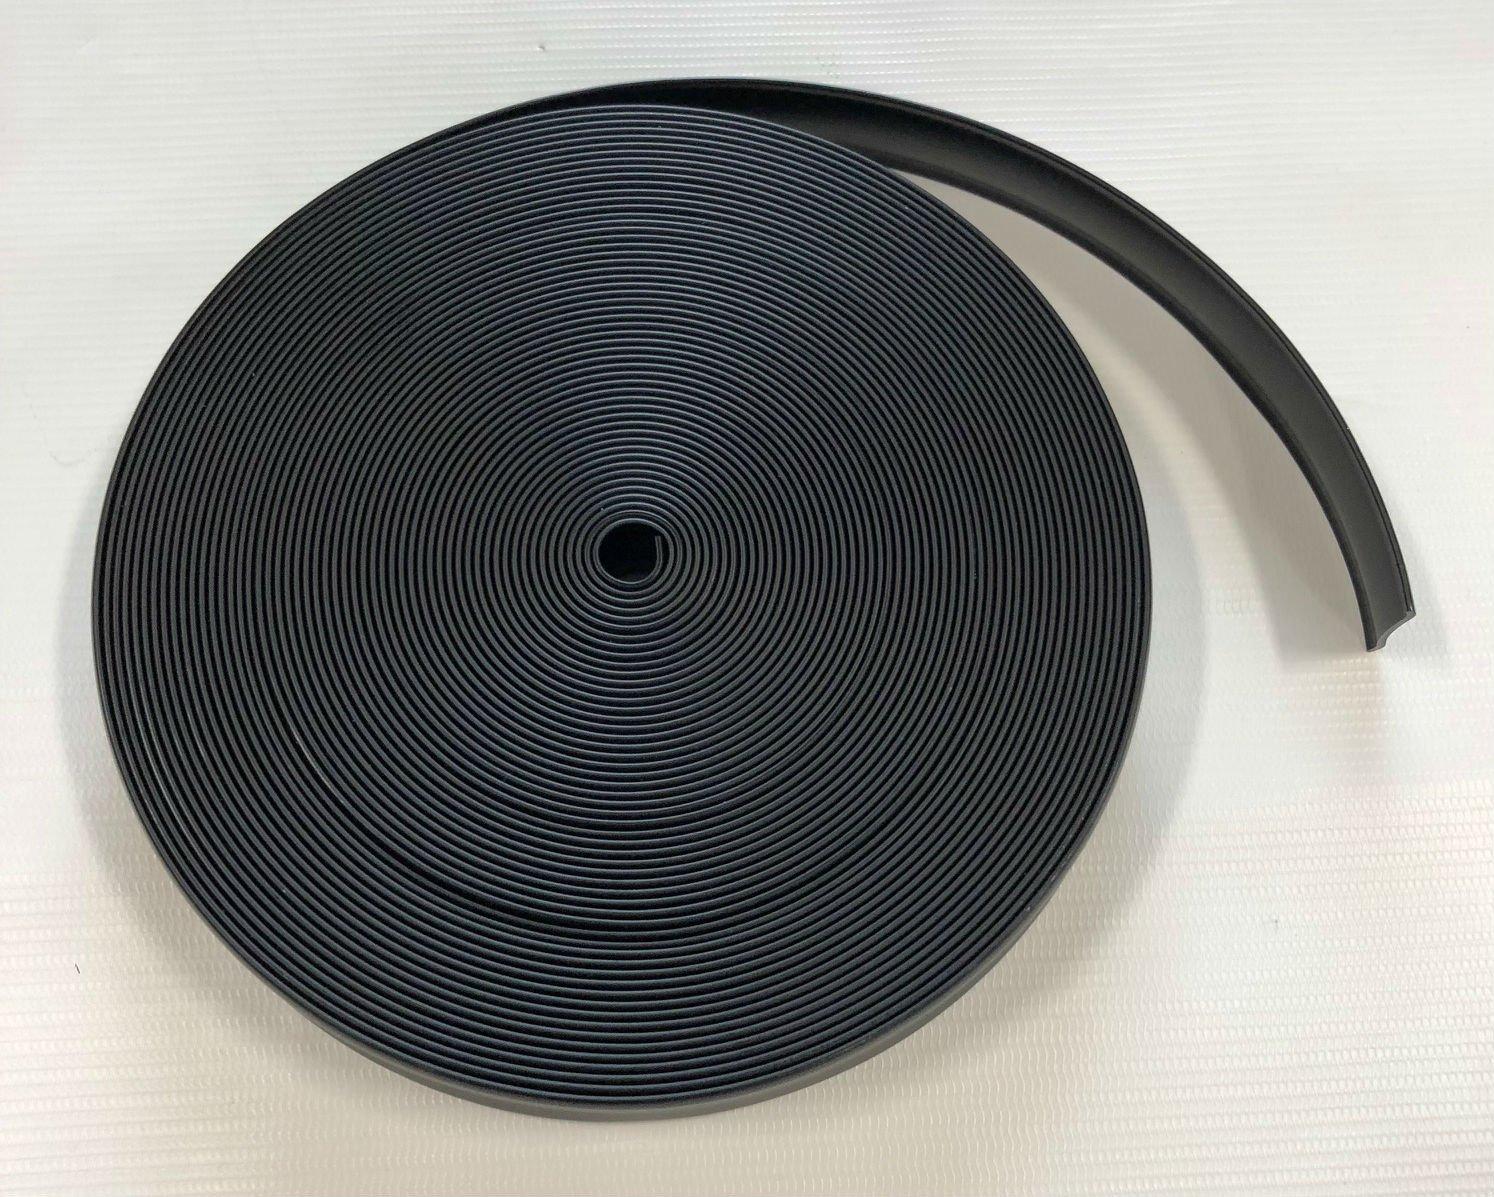 Triton 06111-BK 1 Inch Black Vinyl Trim Insert - 50 Foot Roll by Triton